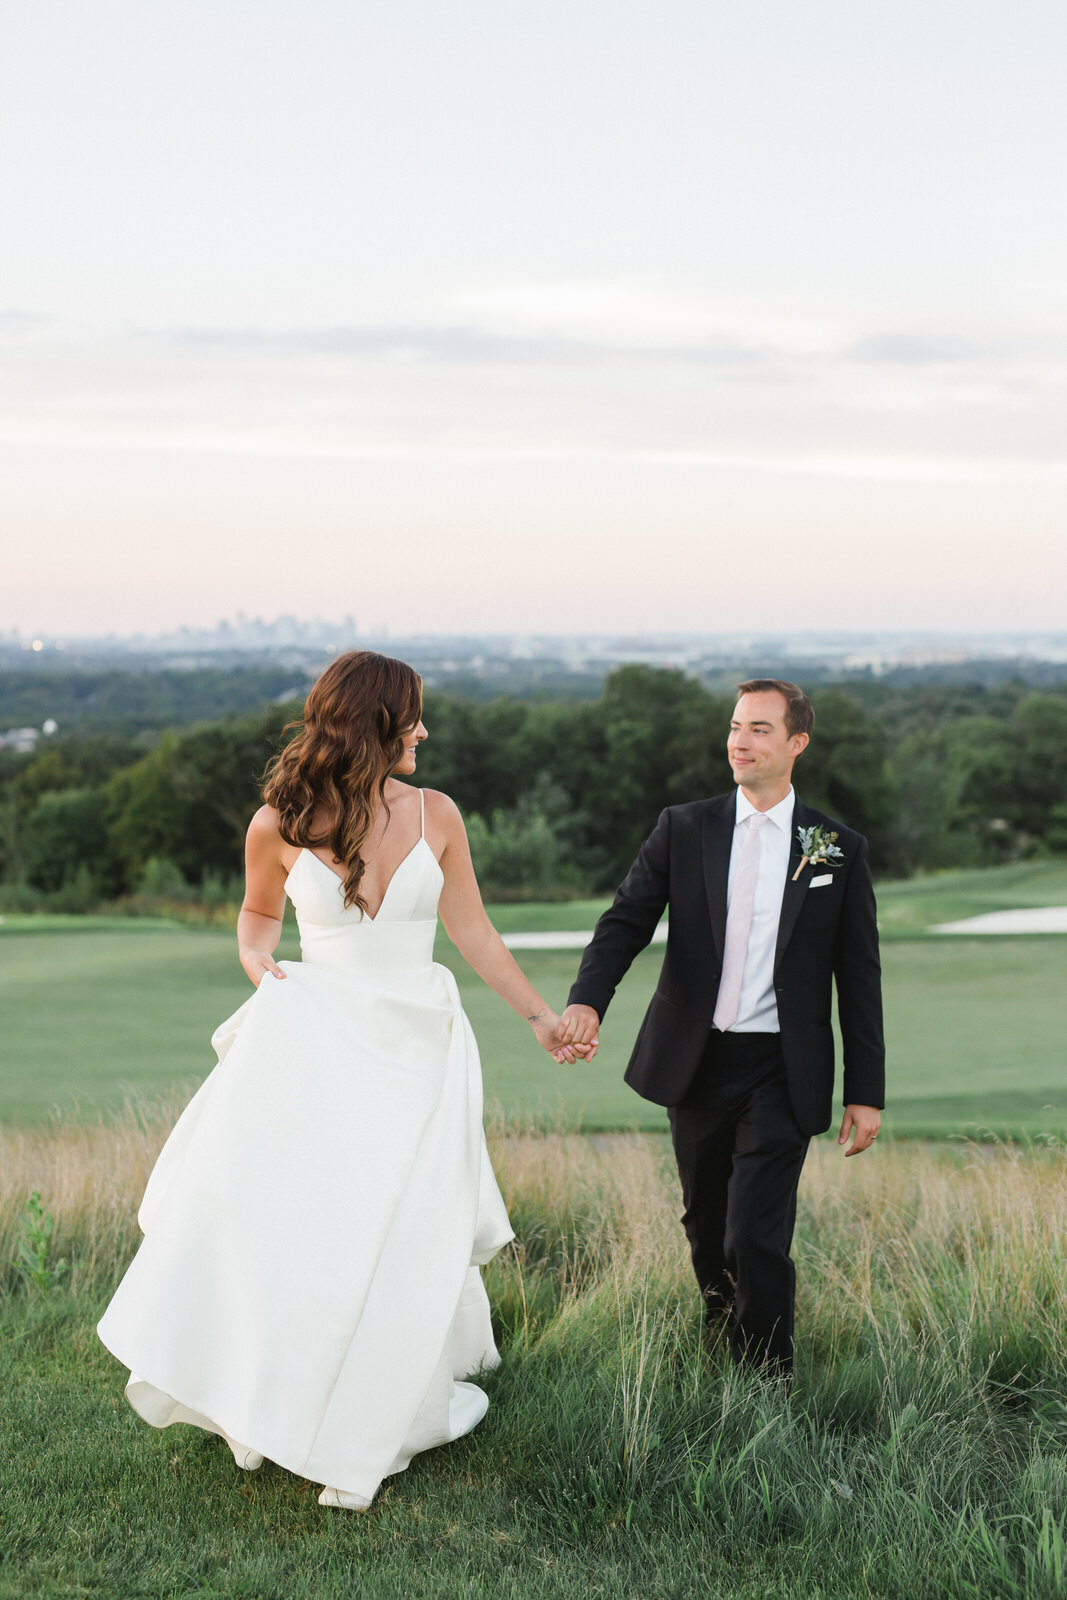 granite-links-wedding-photographer-quincy.JPG